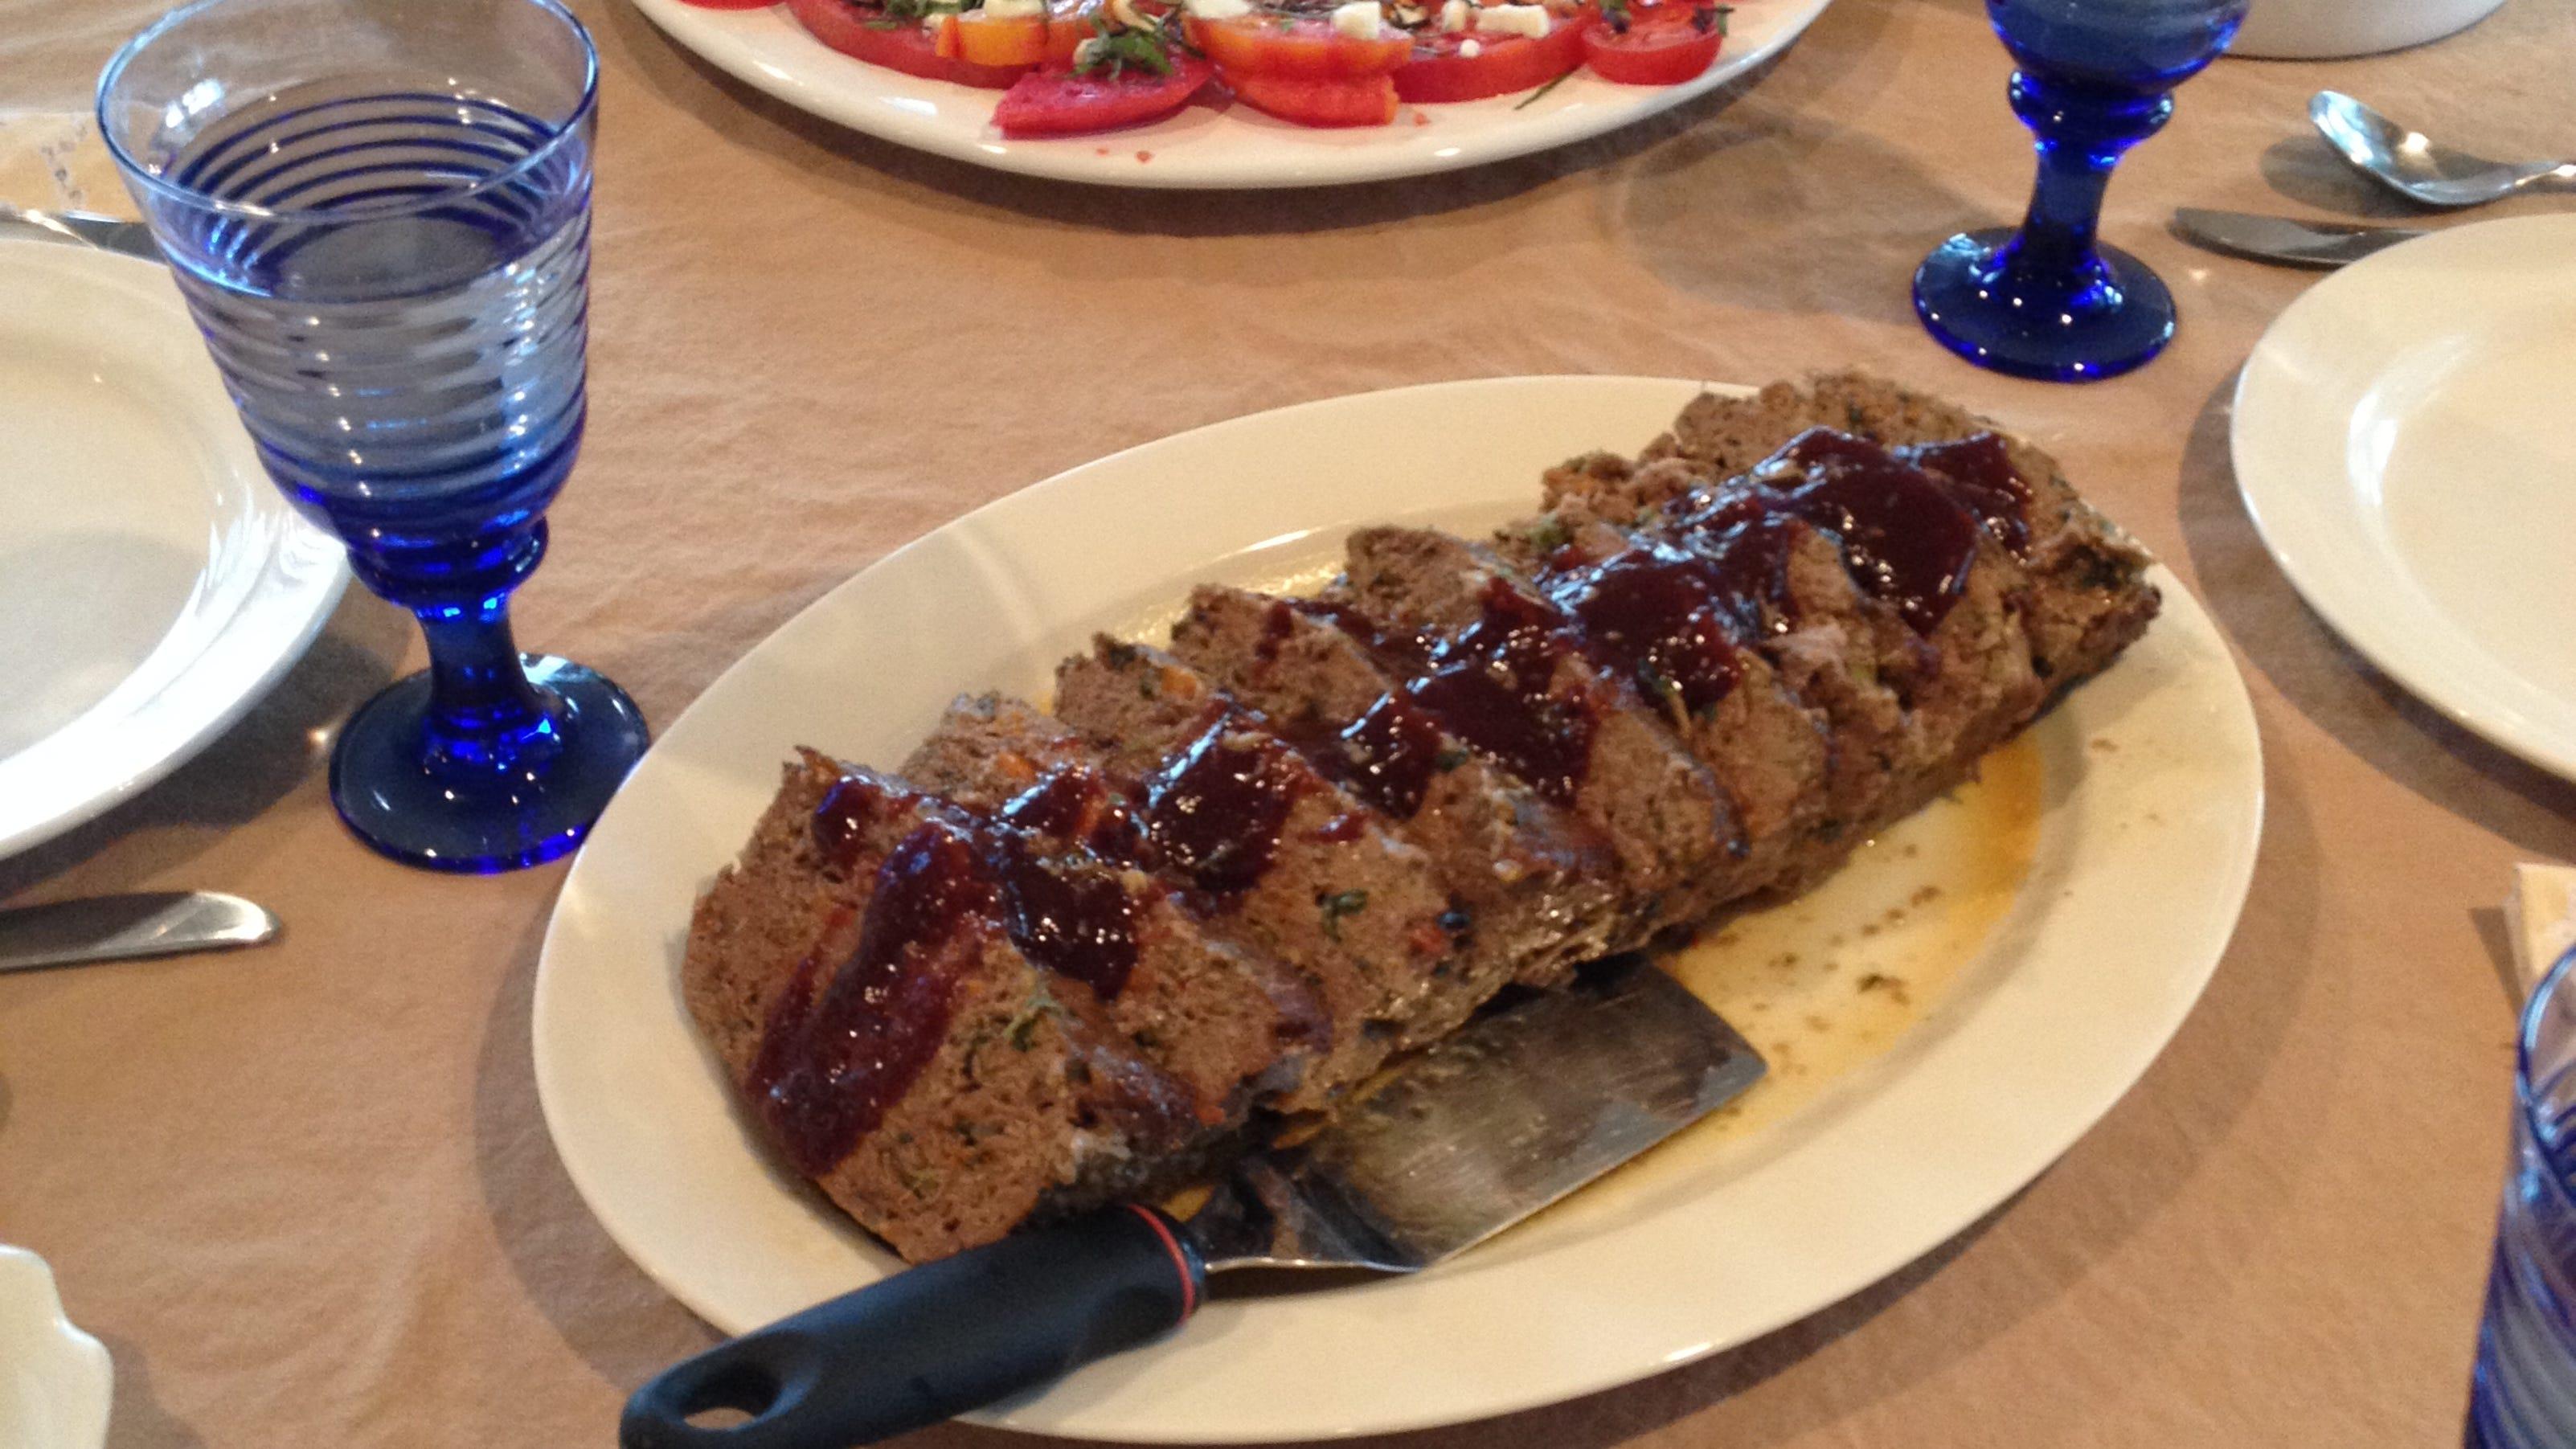 Secret Ingredient In This Meatloaf Lamb